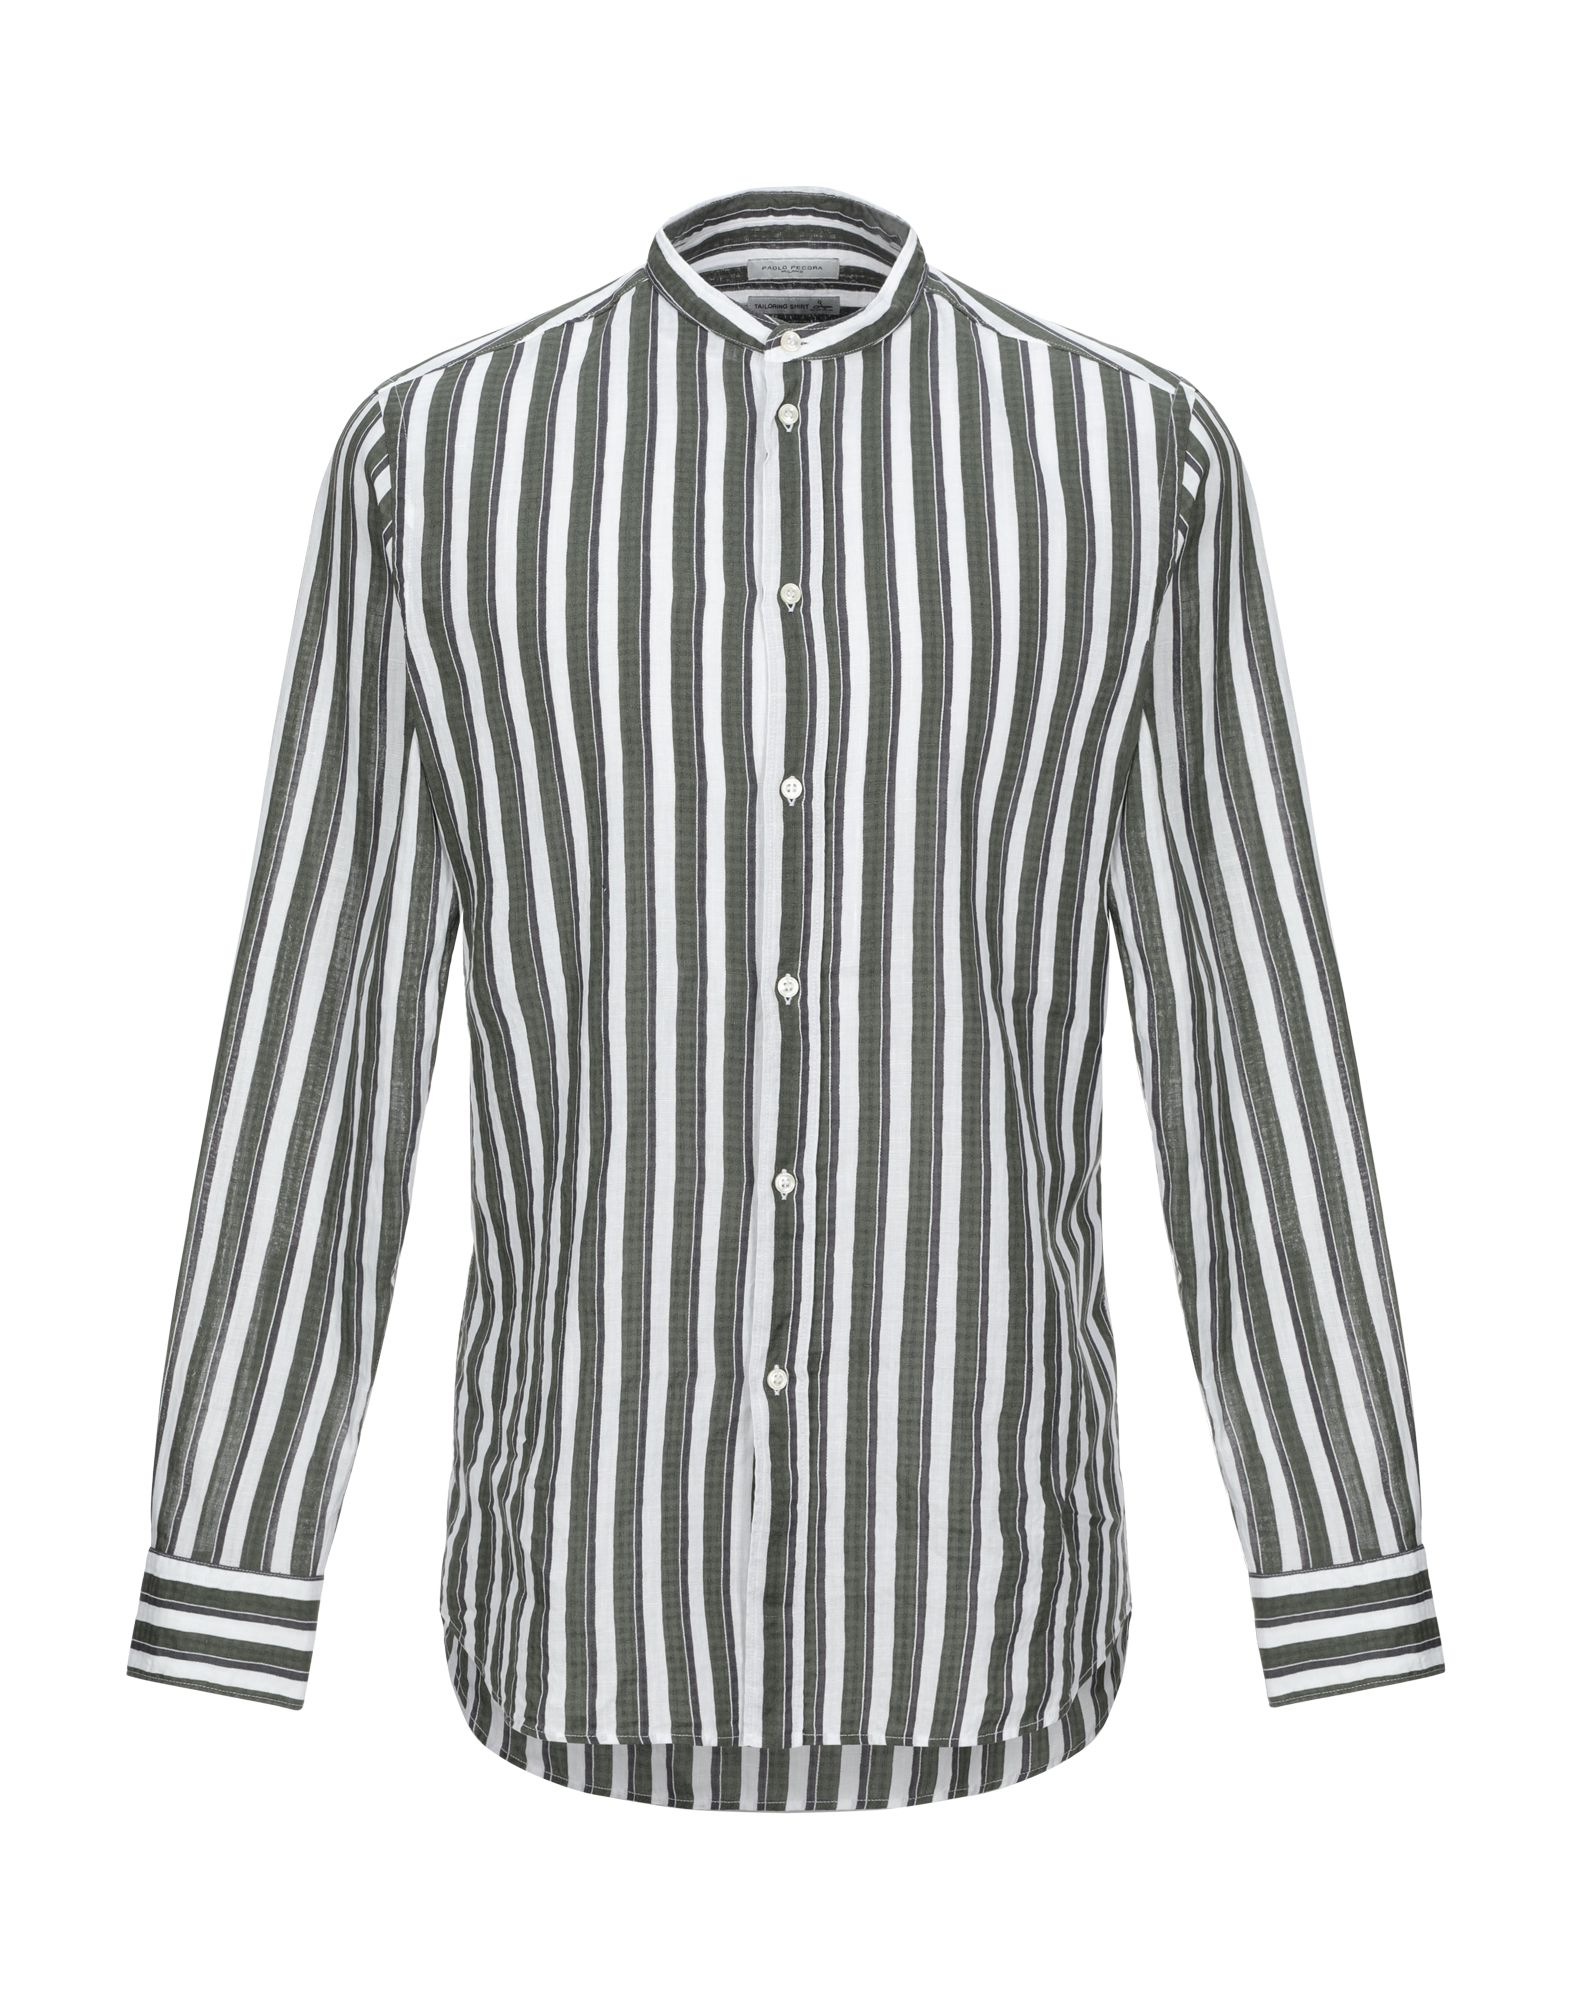 PAOLO PECORA Pубашка paolo casalini пиджак